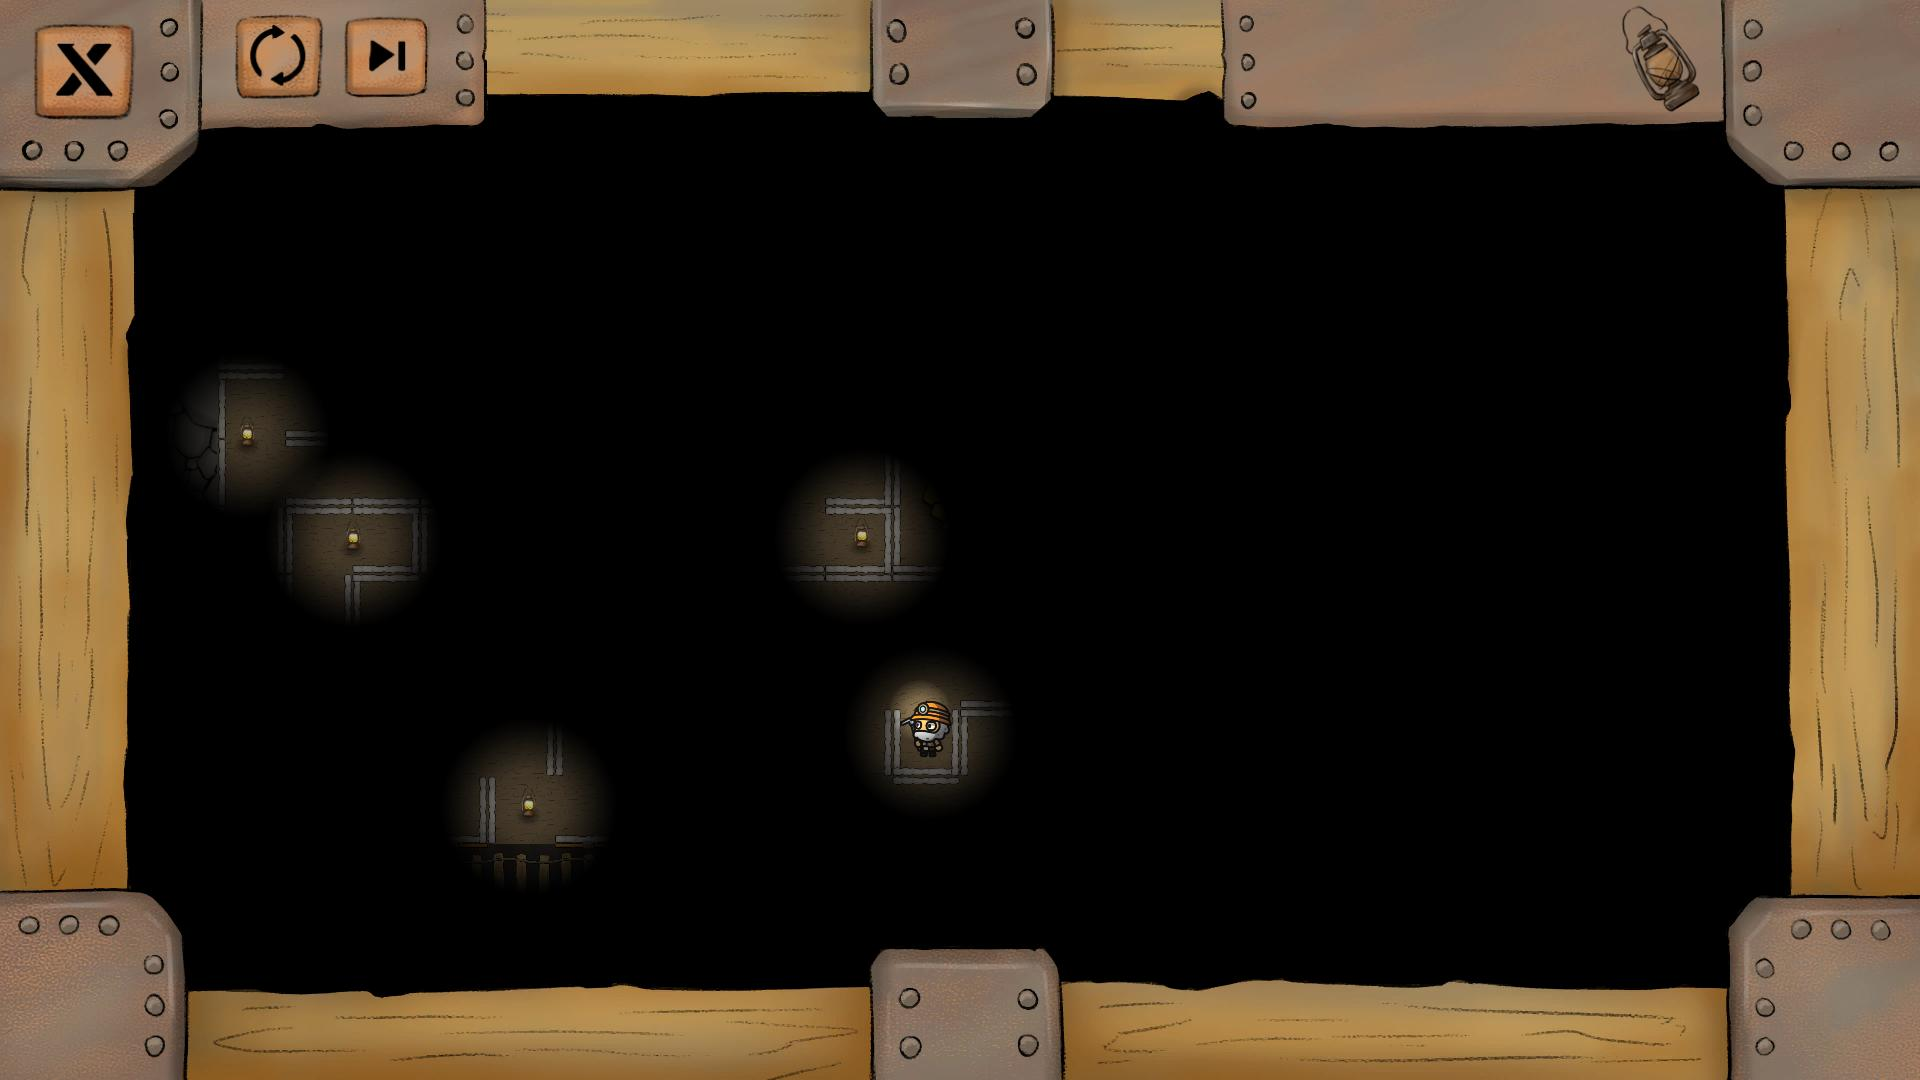 Gold Digger Maze for PC screenshot